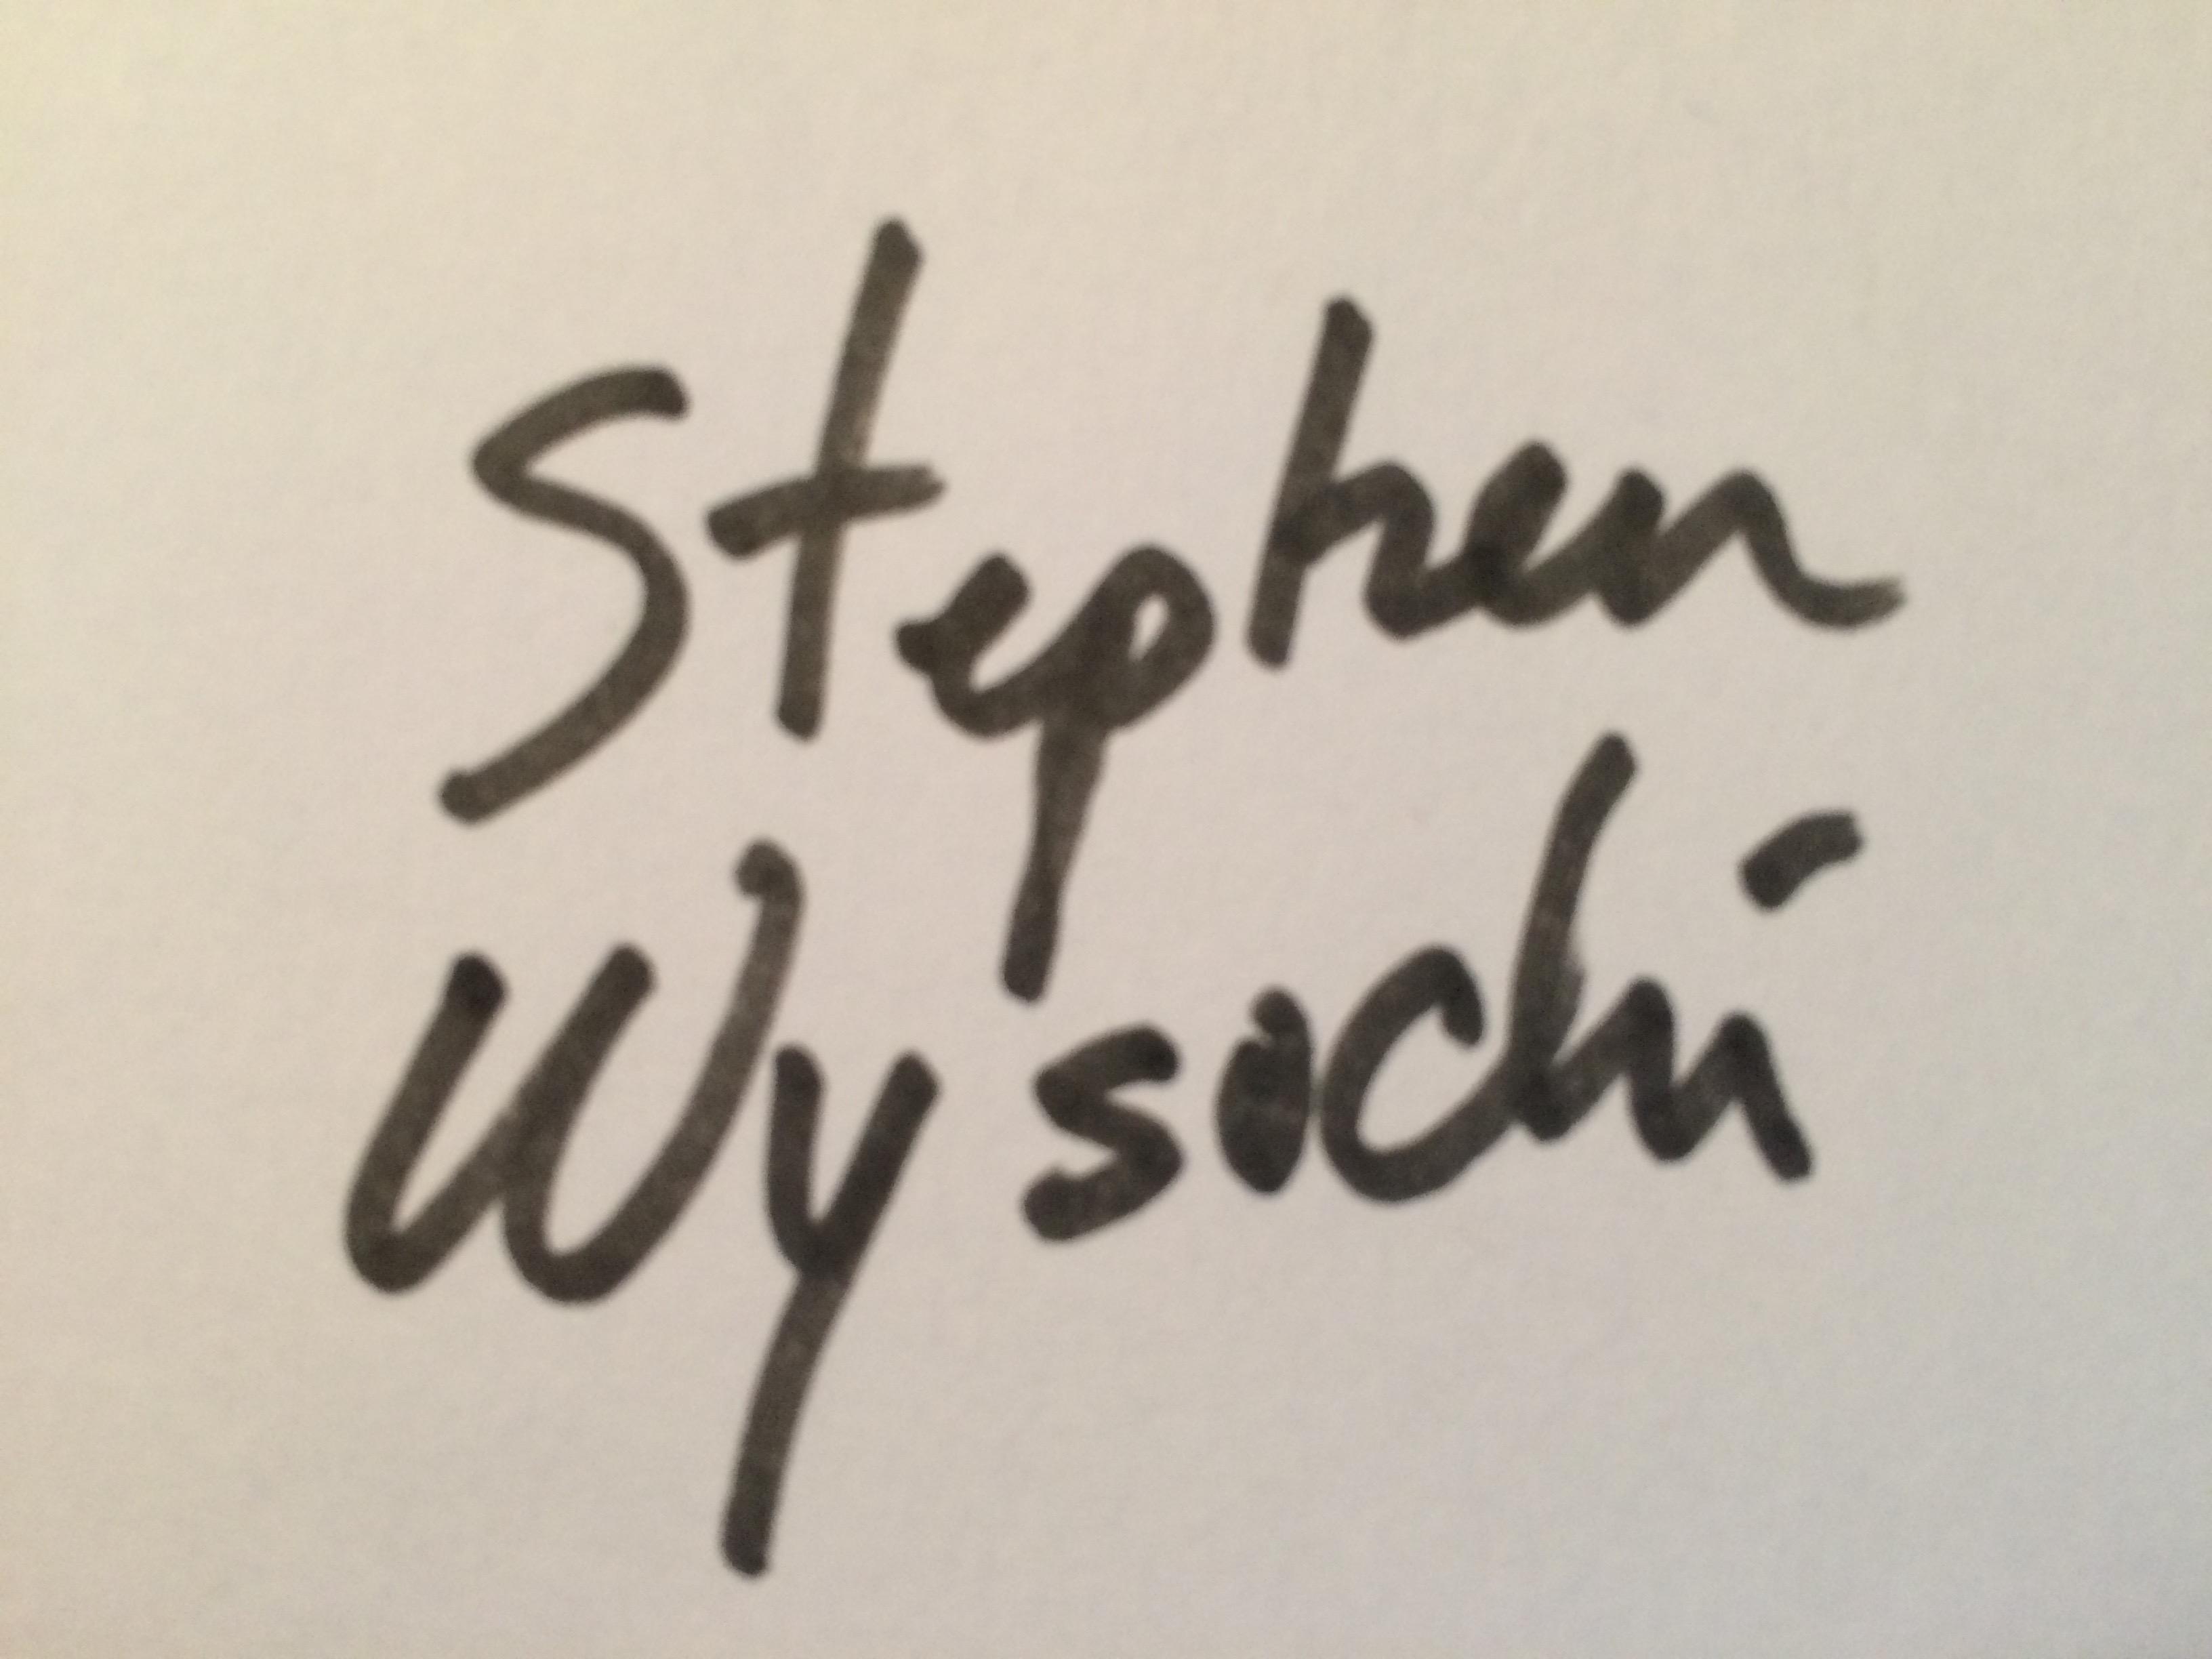 Stephen Wysocki Signature